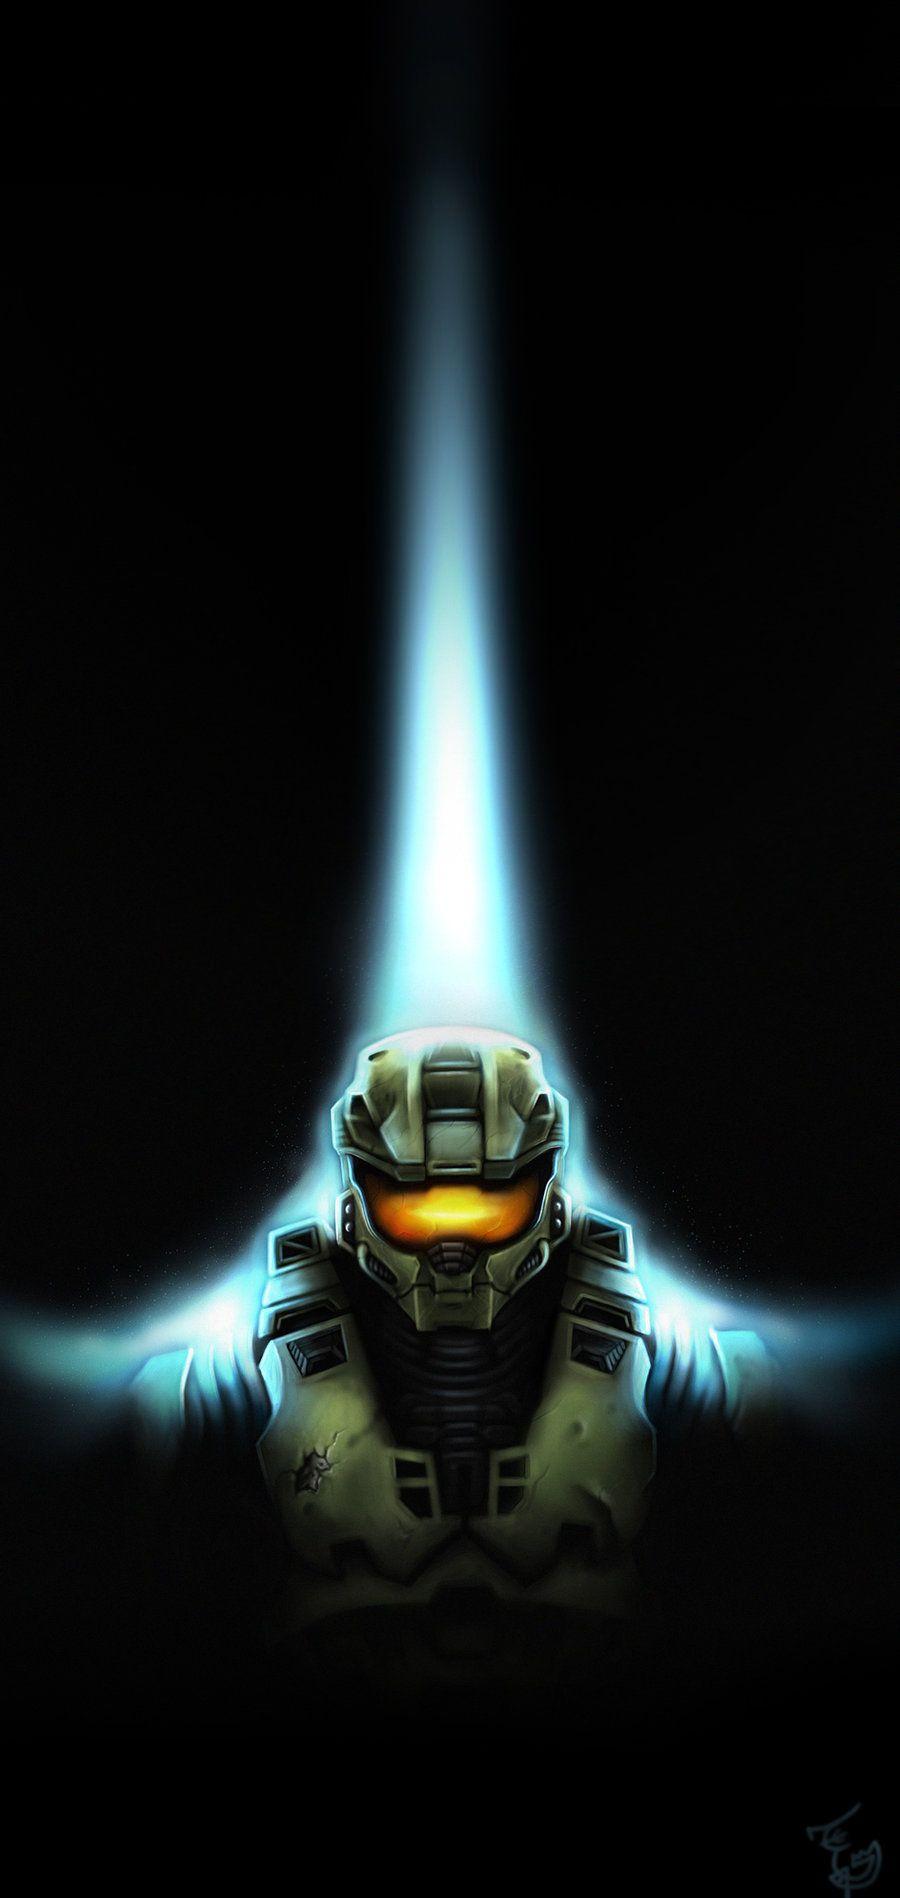 Halo Anniversary by ~thegameworld on deviantART